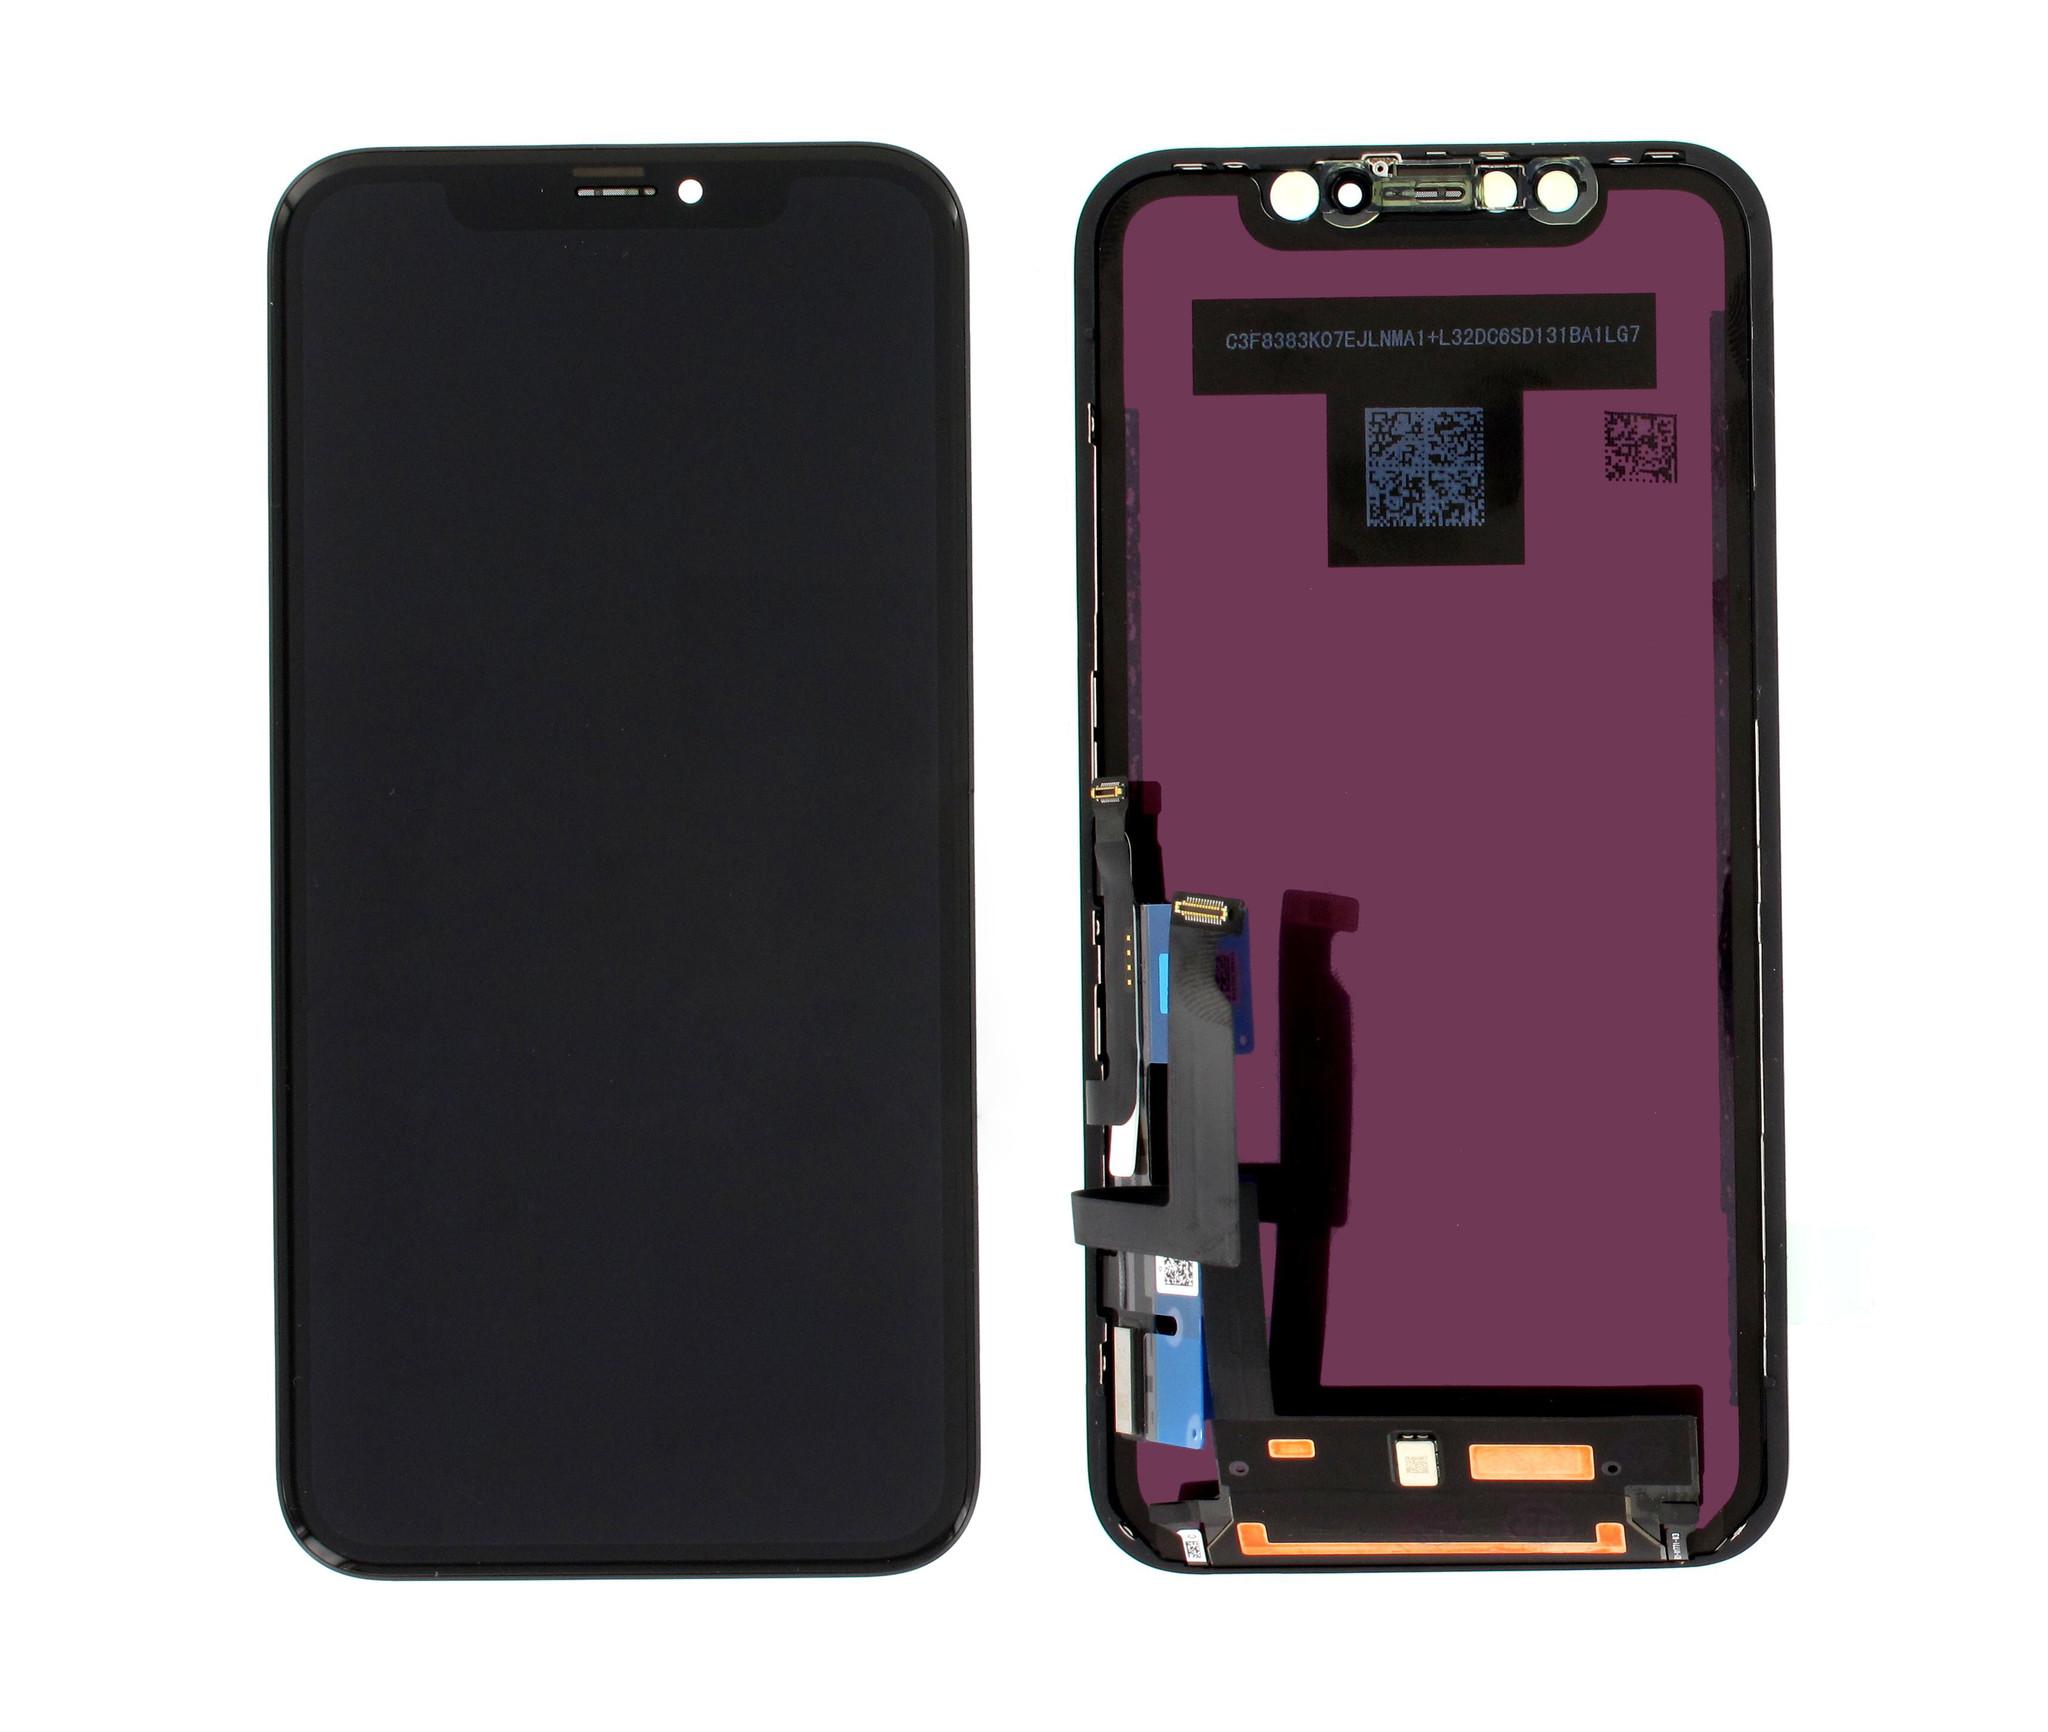 LCD Display Modul, OEM, Schwarz, Kompatibel Mit Dem Apple iPhone XR